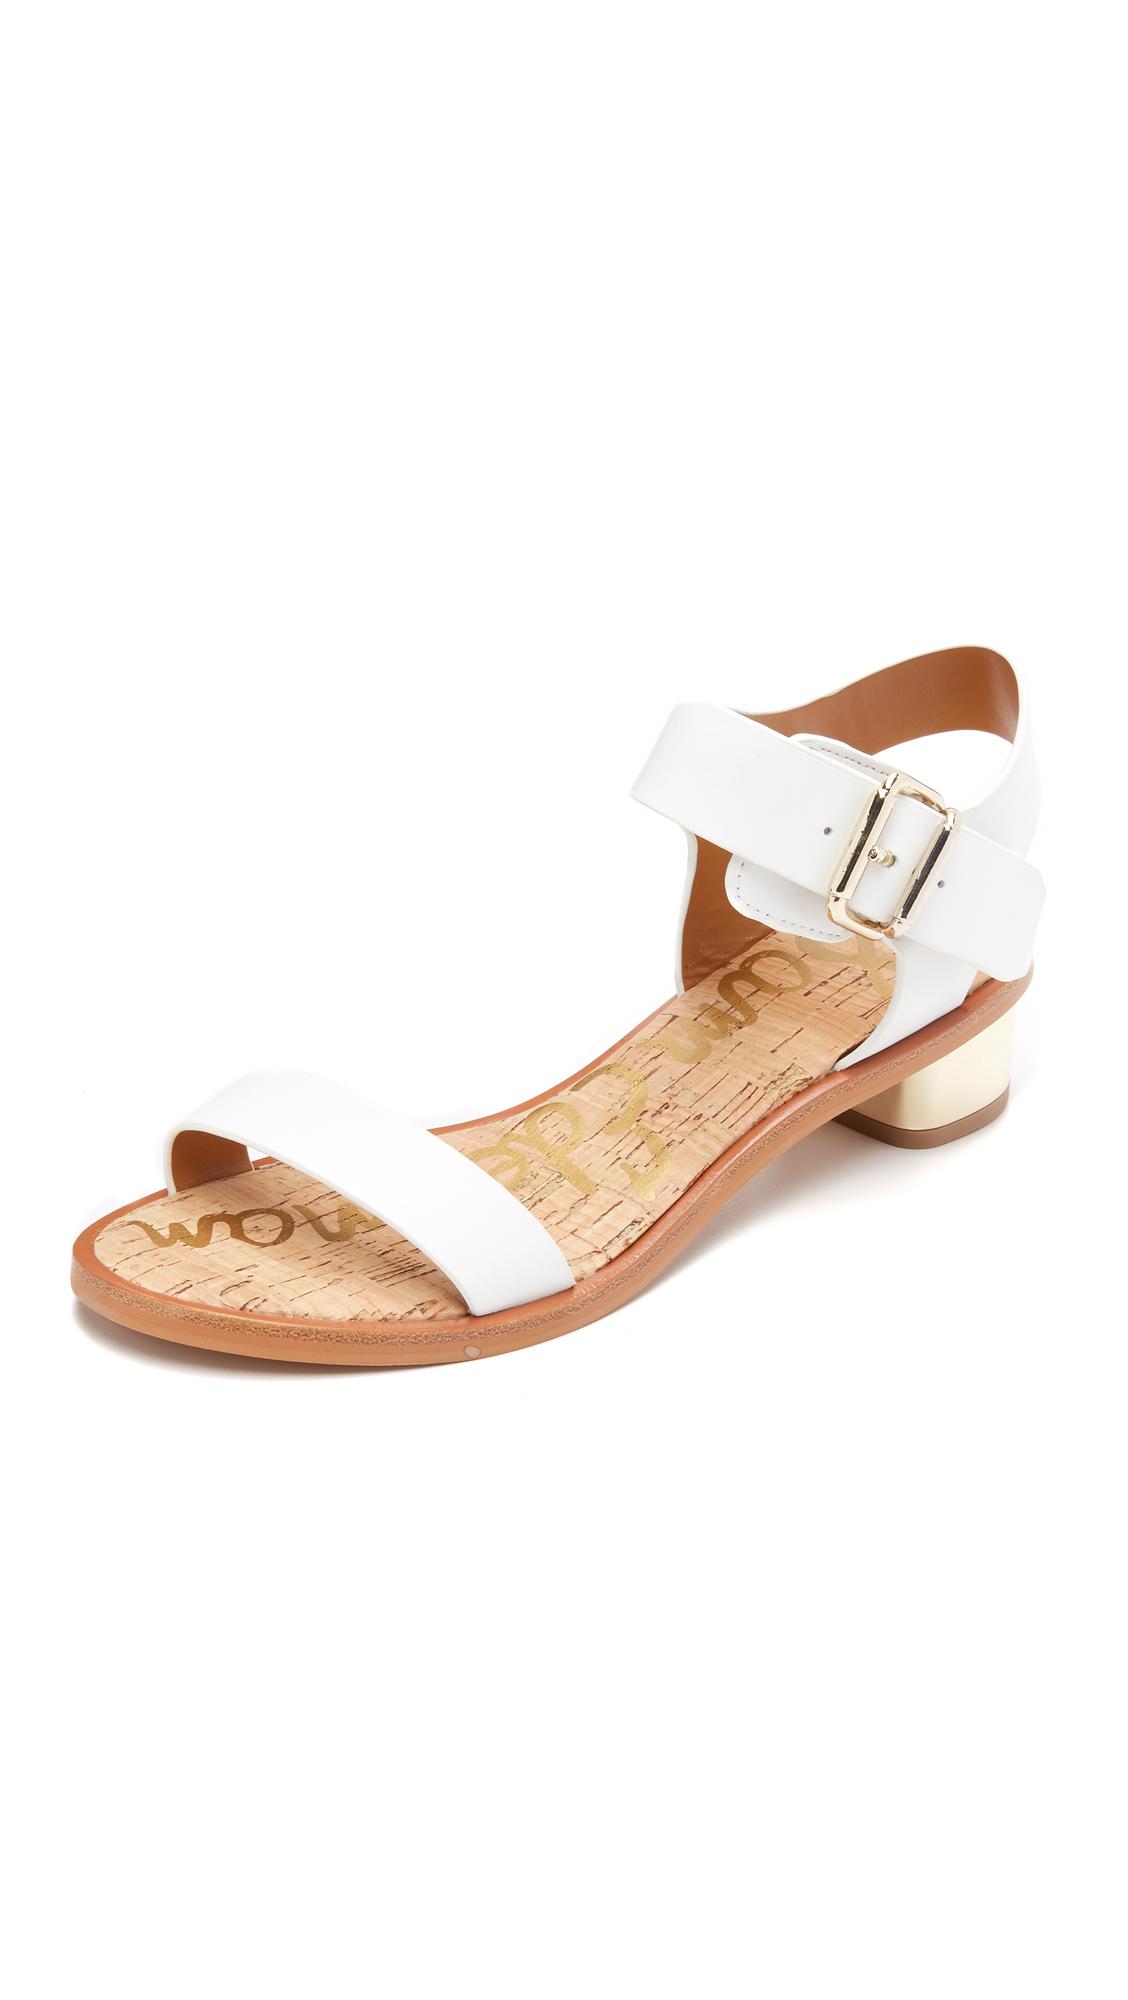 05a7fa055 Lyst - Sam Edelman Trina City Sandals in White